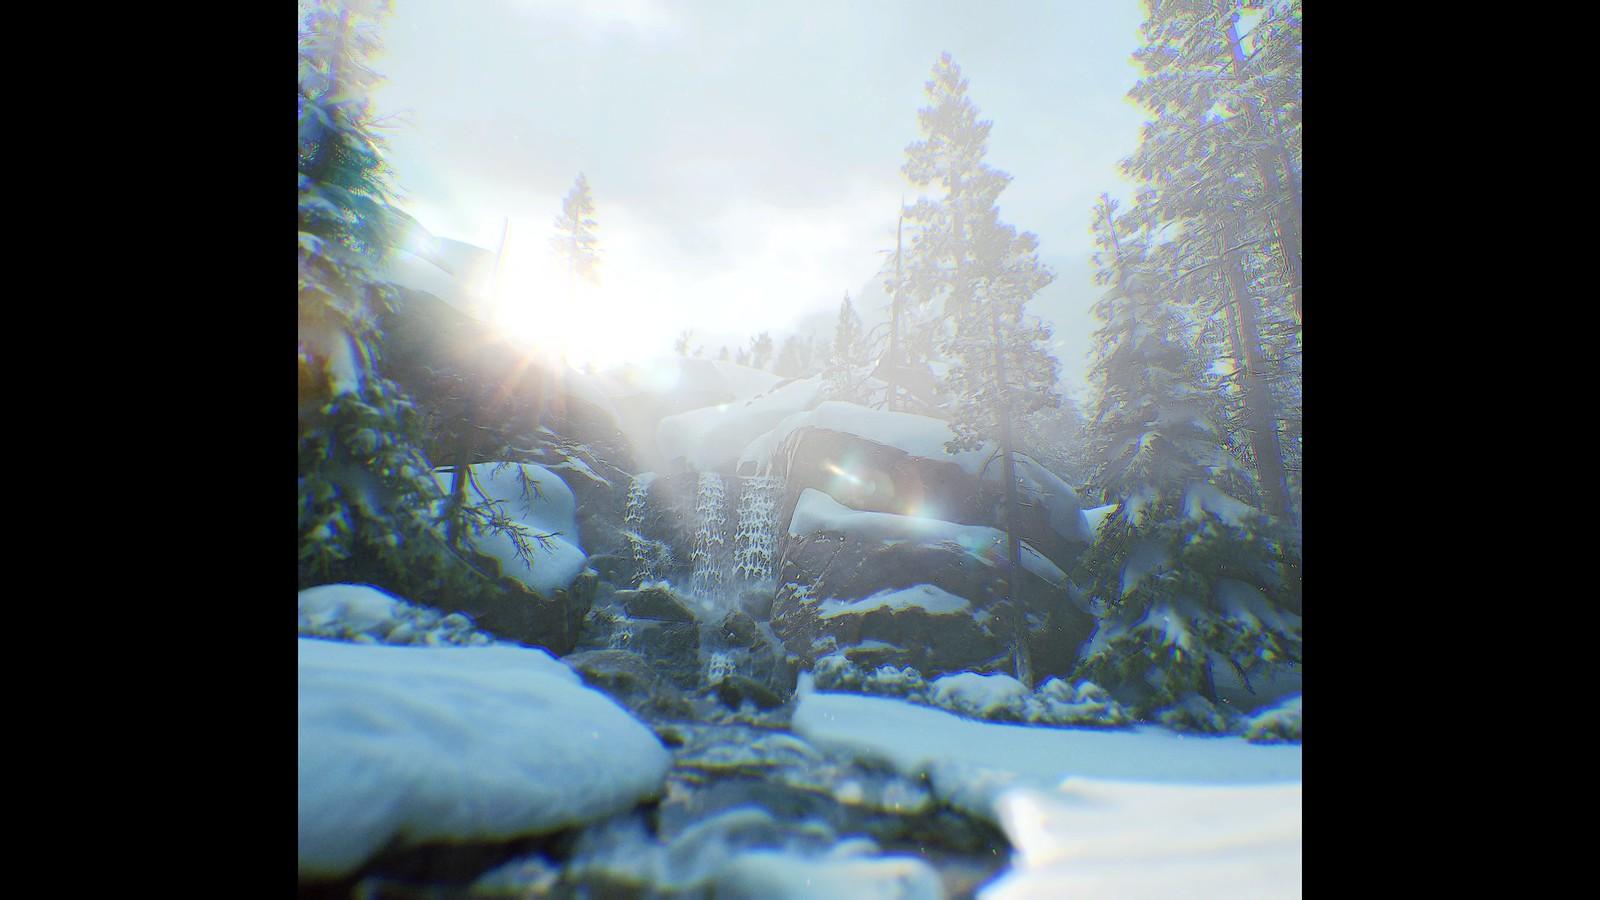 The Last of Us Part II_Waterfall-1 - Matt Neapolitan